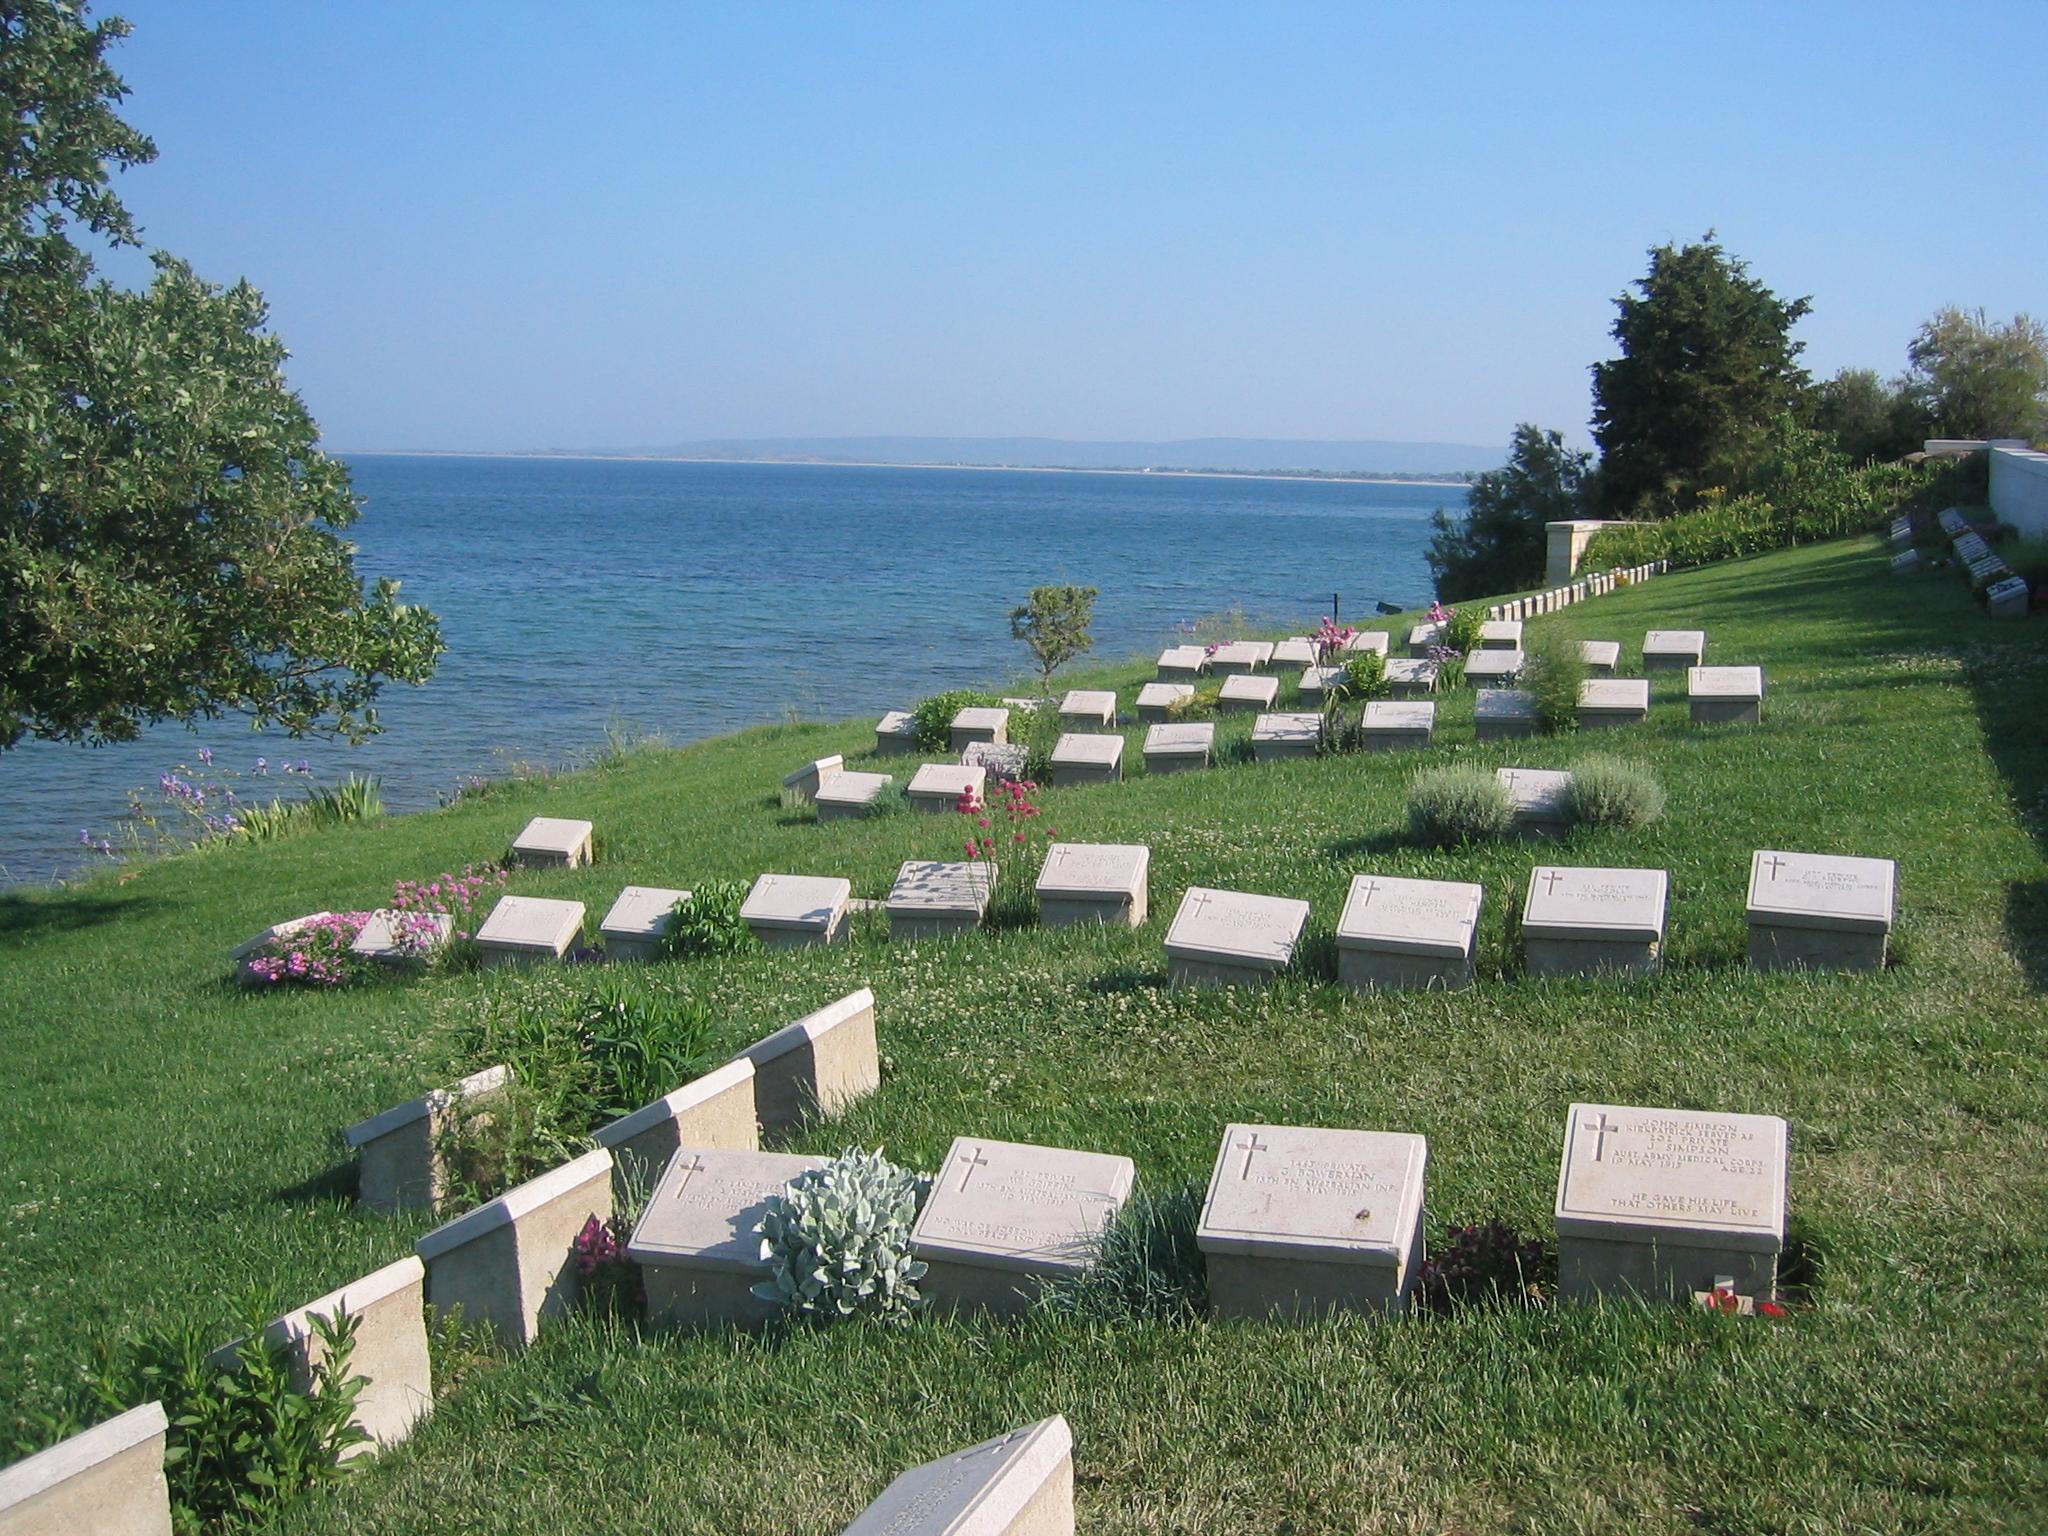 File:Beach CWGC Cemetery, Gallipoli.jpg - Wikimedia Commons